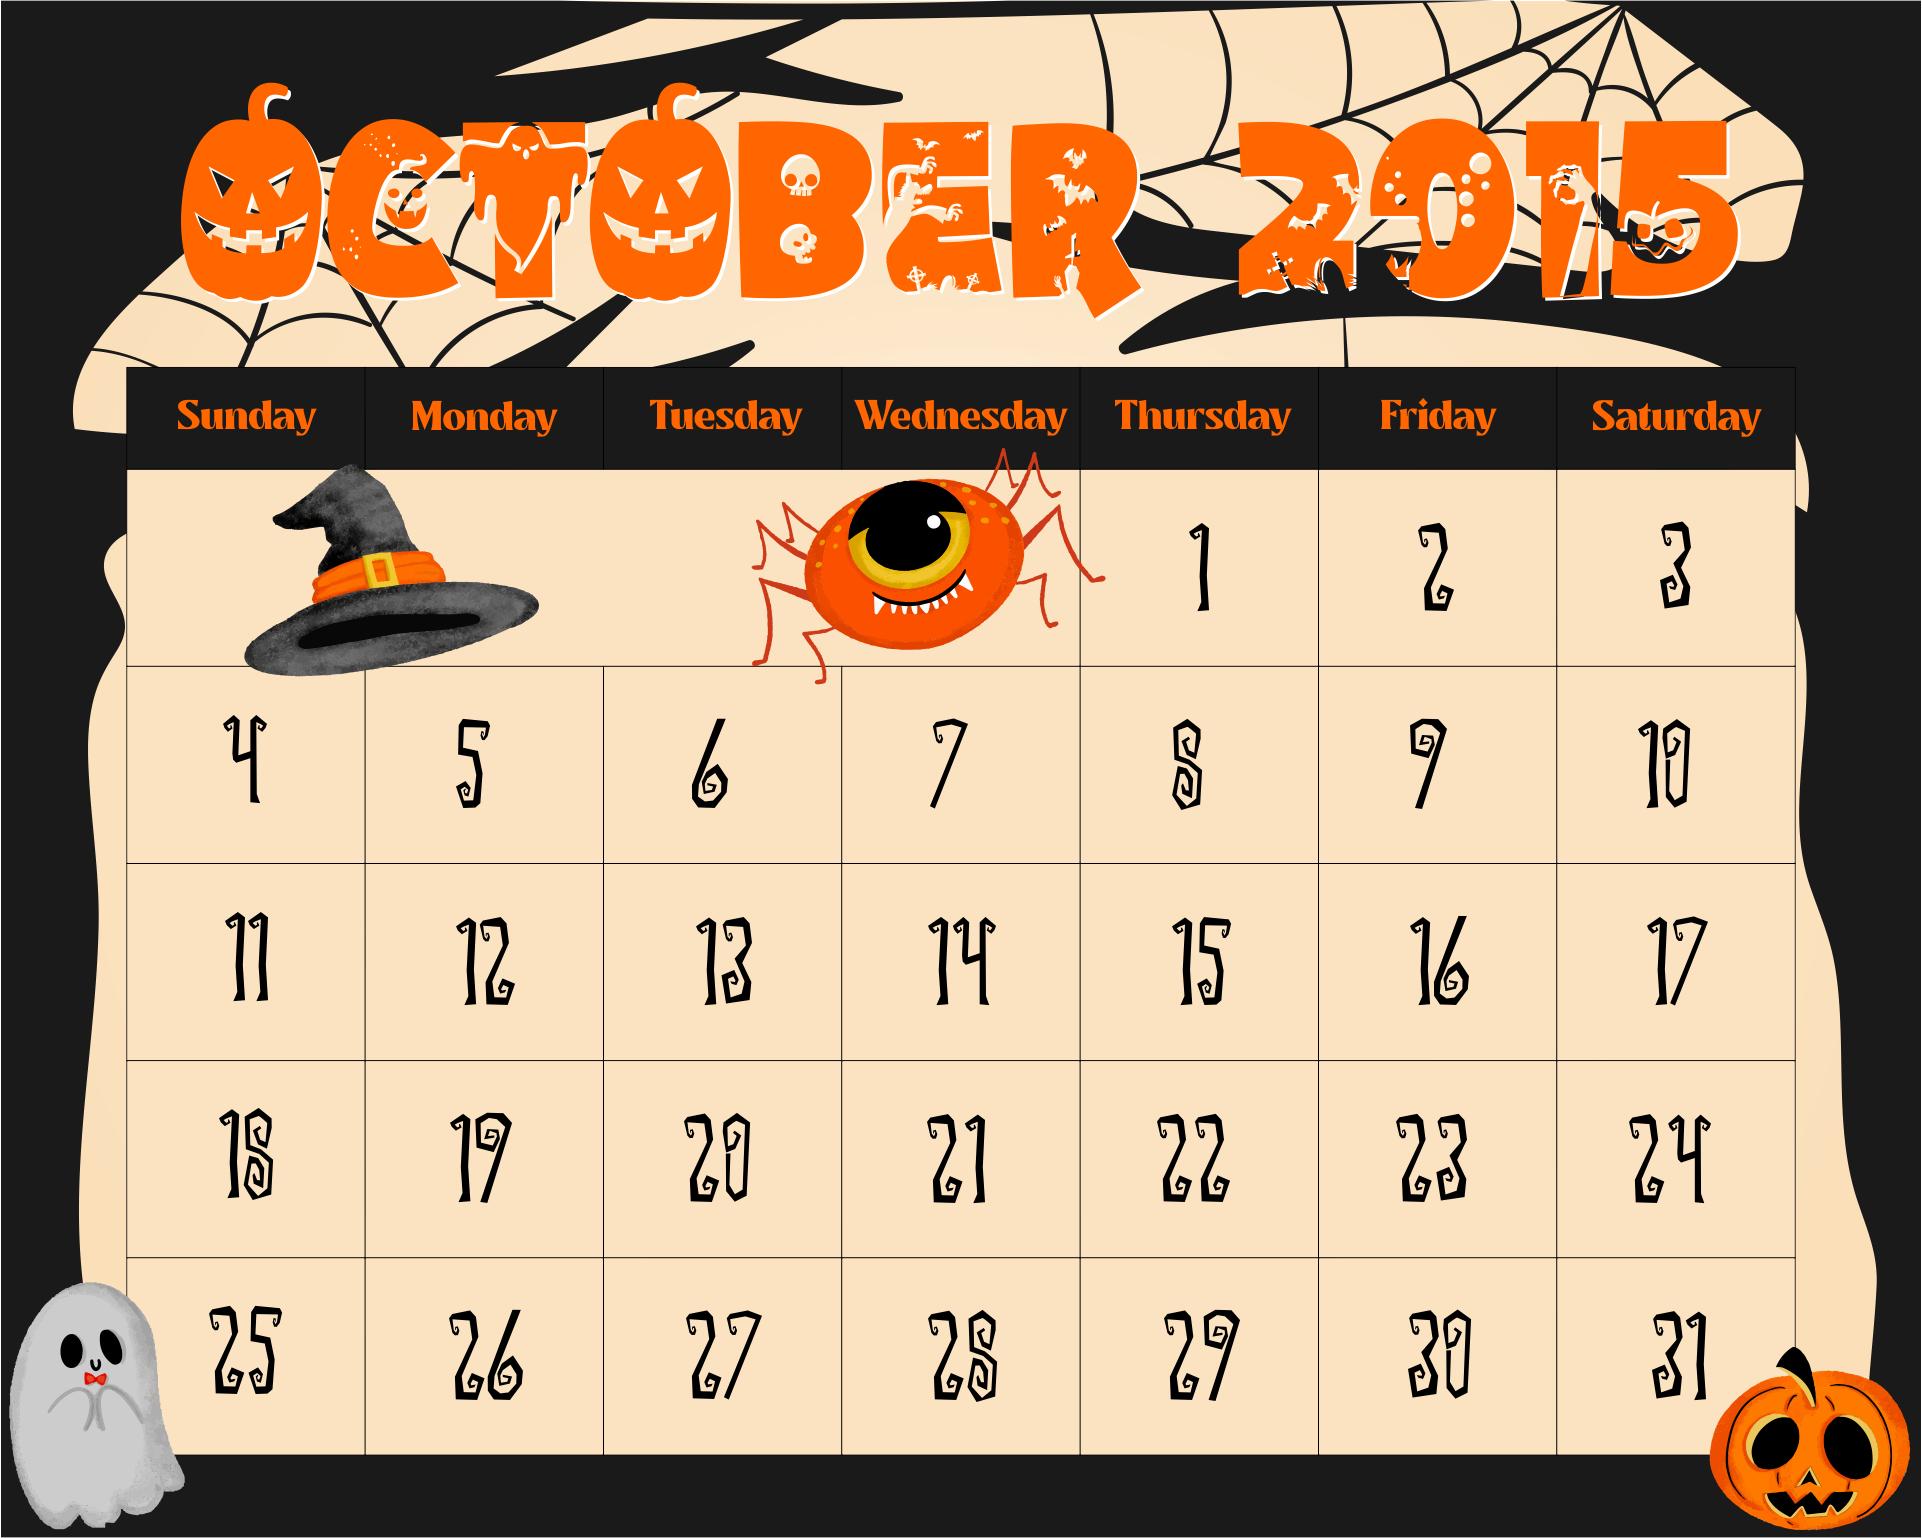 5 Best Images of 2015 Calendar Printable October Halloween - 2016 Halloween Calendar